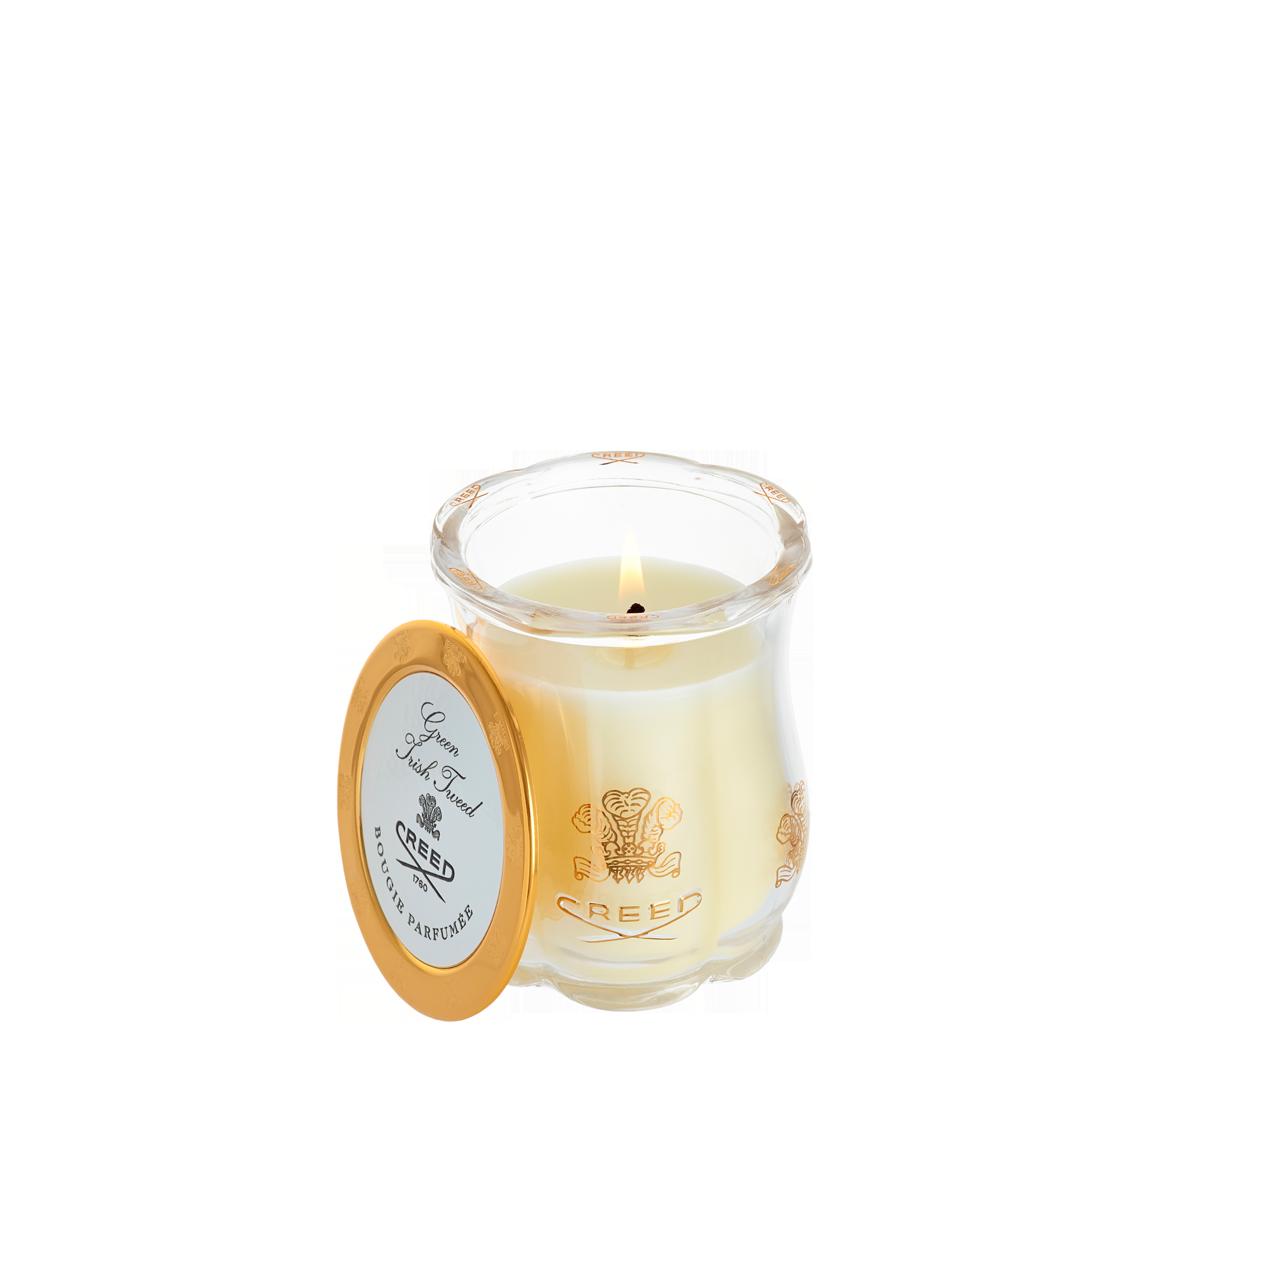 Green Irish Tweed - Candle